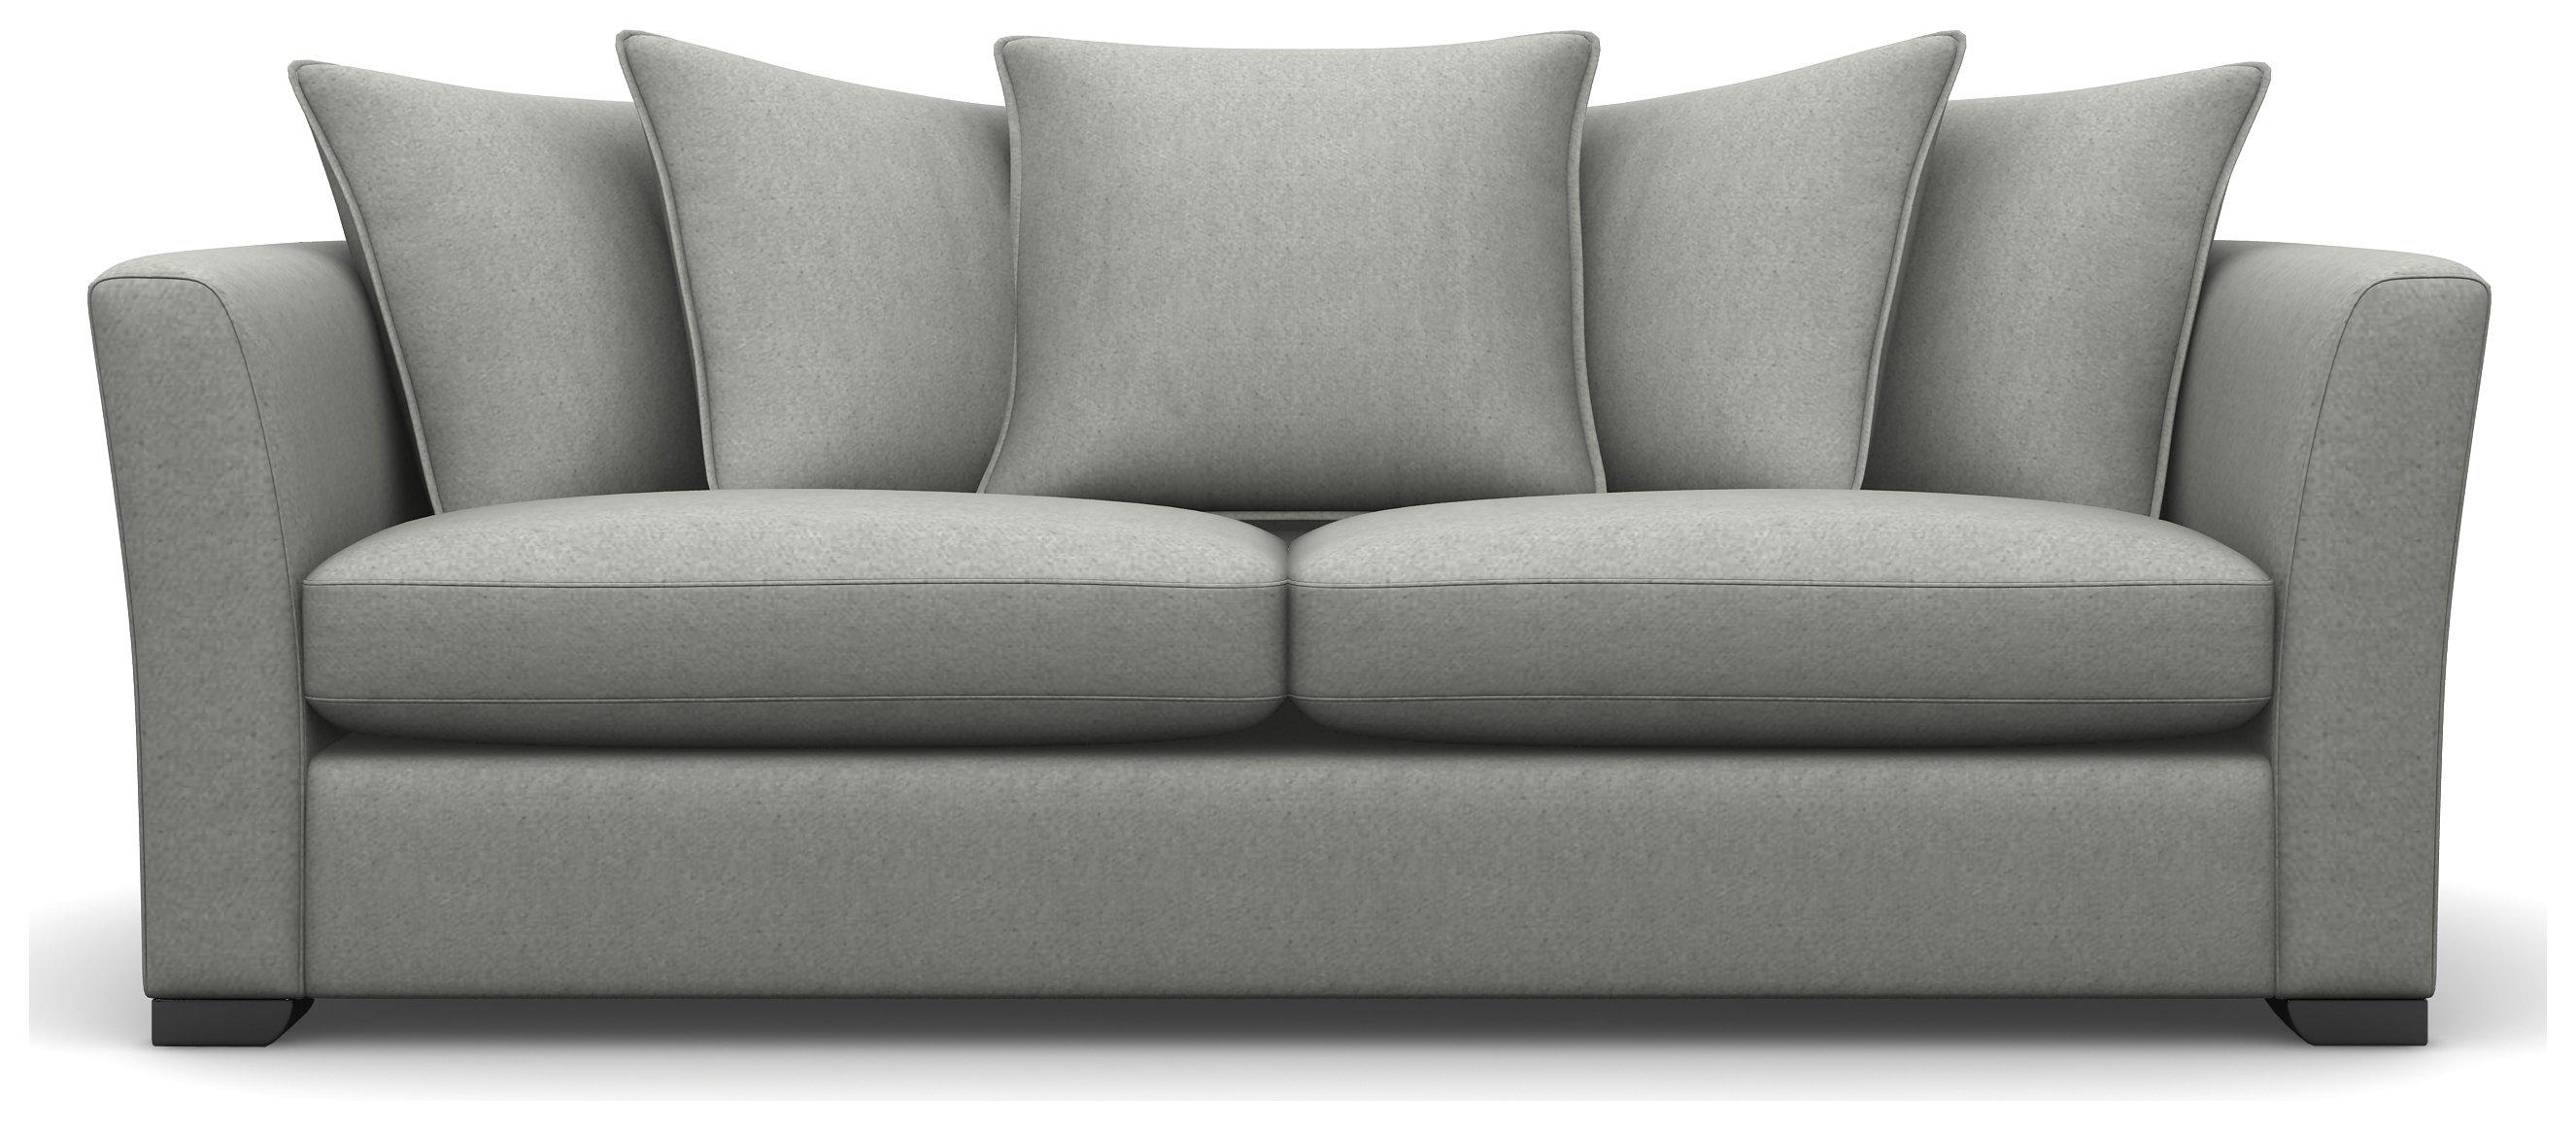 Heart of House Libby 3 Seater Fabric Sofa - Light Grey + Black Legs